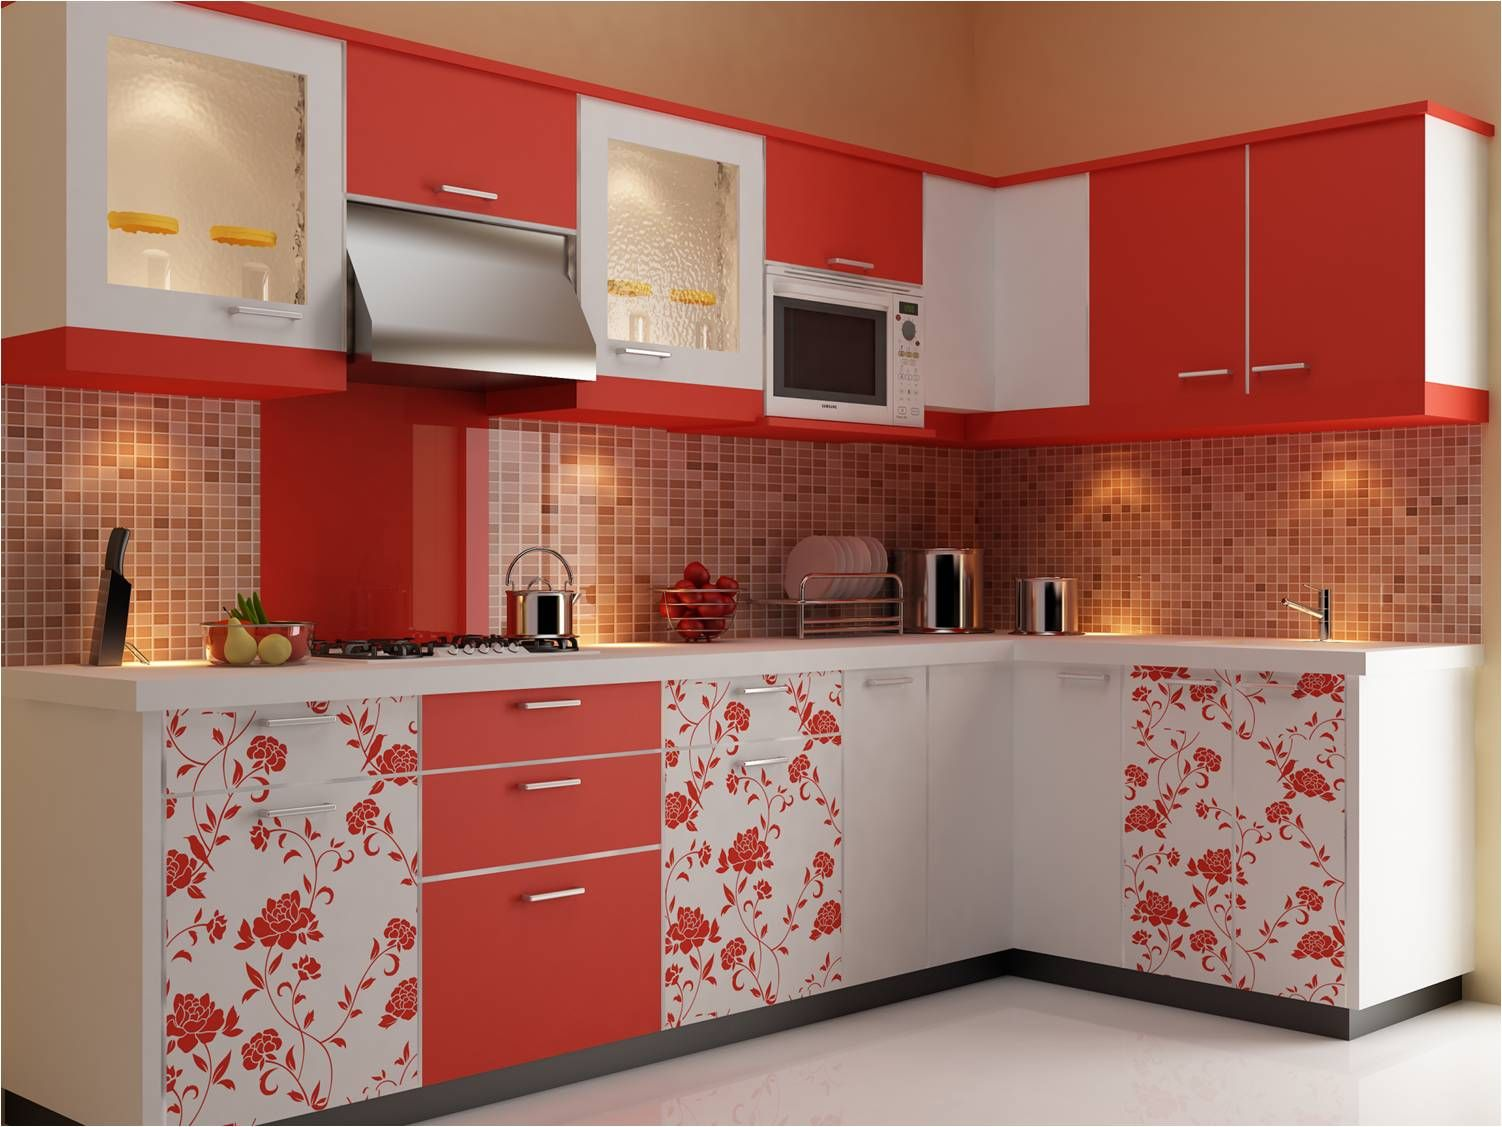 Modularkitchen%281%29 1502×1127  Cocinas  Pinterest Glamorous Small Kitchen Interior Design Images Review